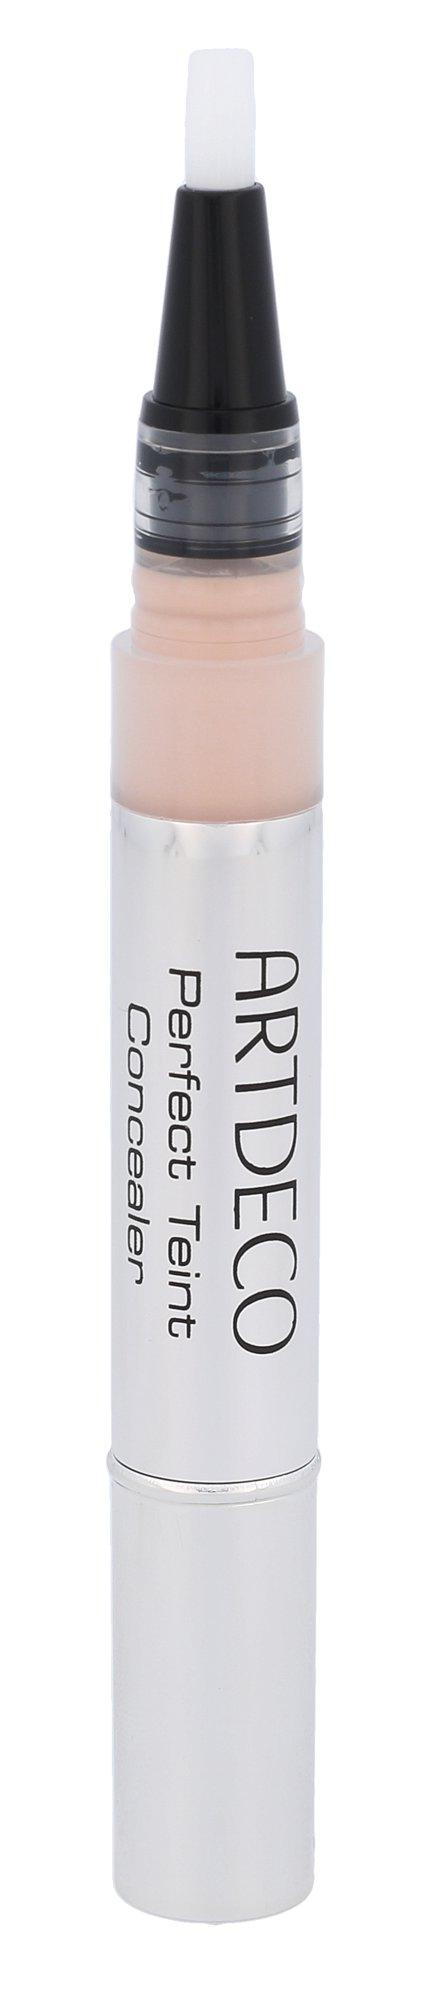 Artdeco Perfect Teint Concealer (3 Peach) 2 ml 92311